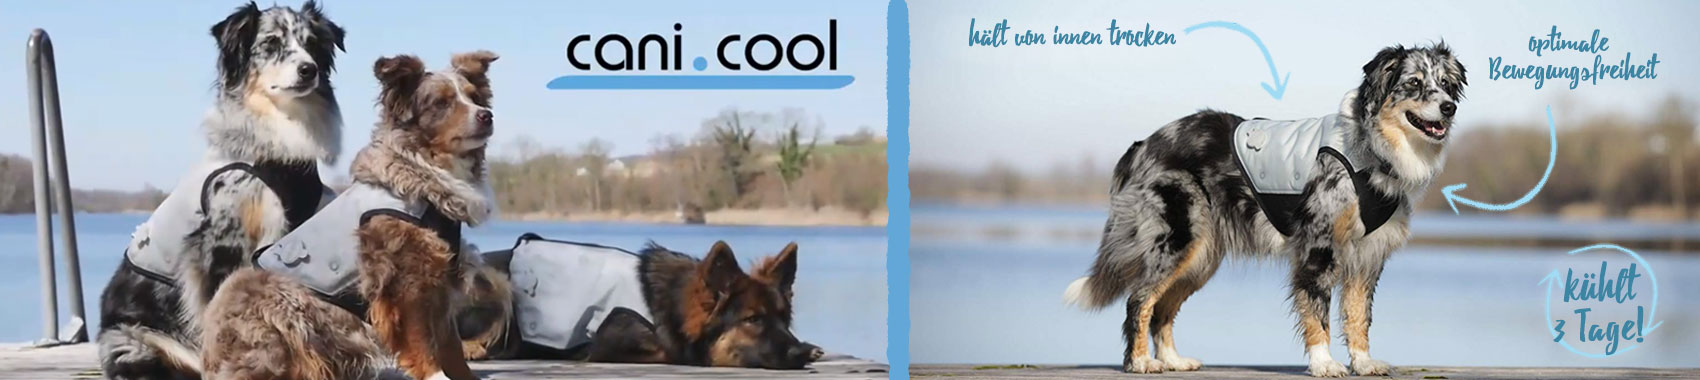 Hunde bei Hitze abkühlen, Bild 3